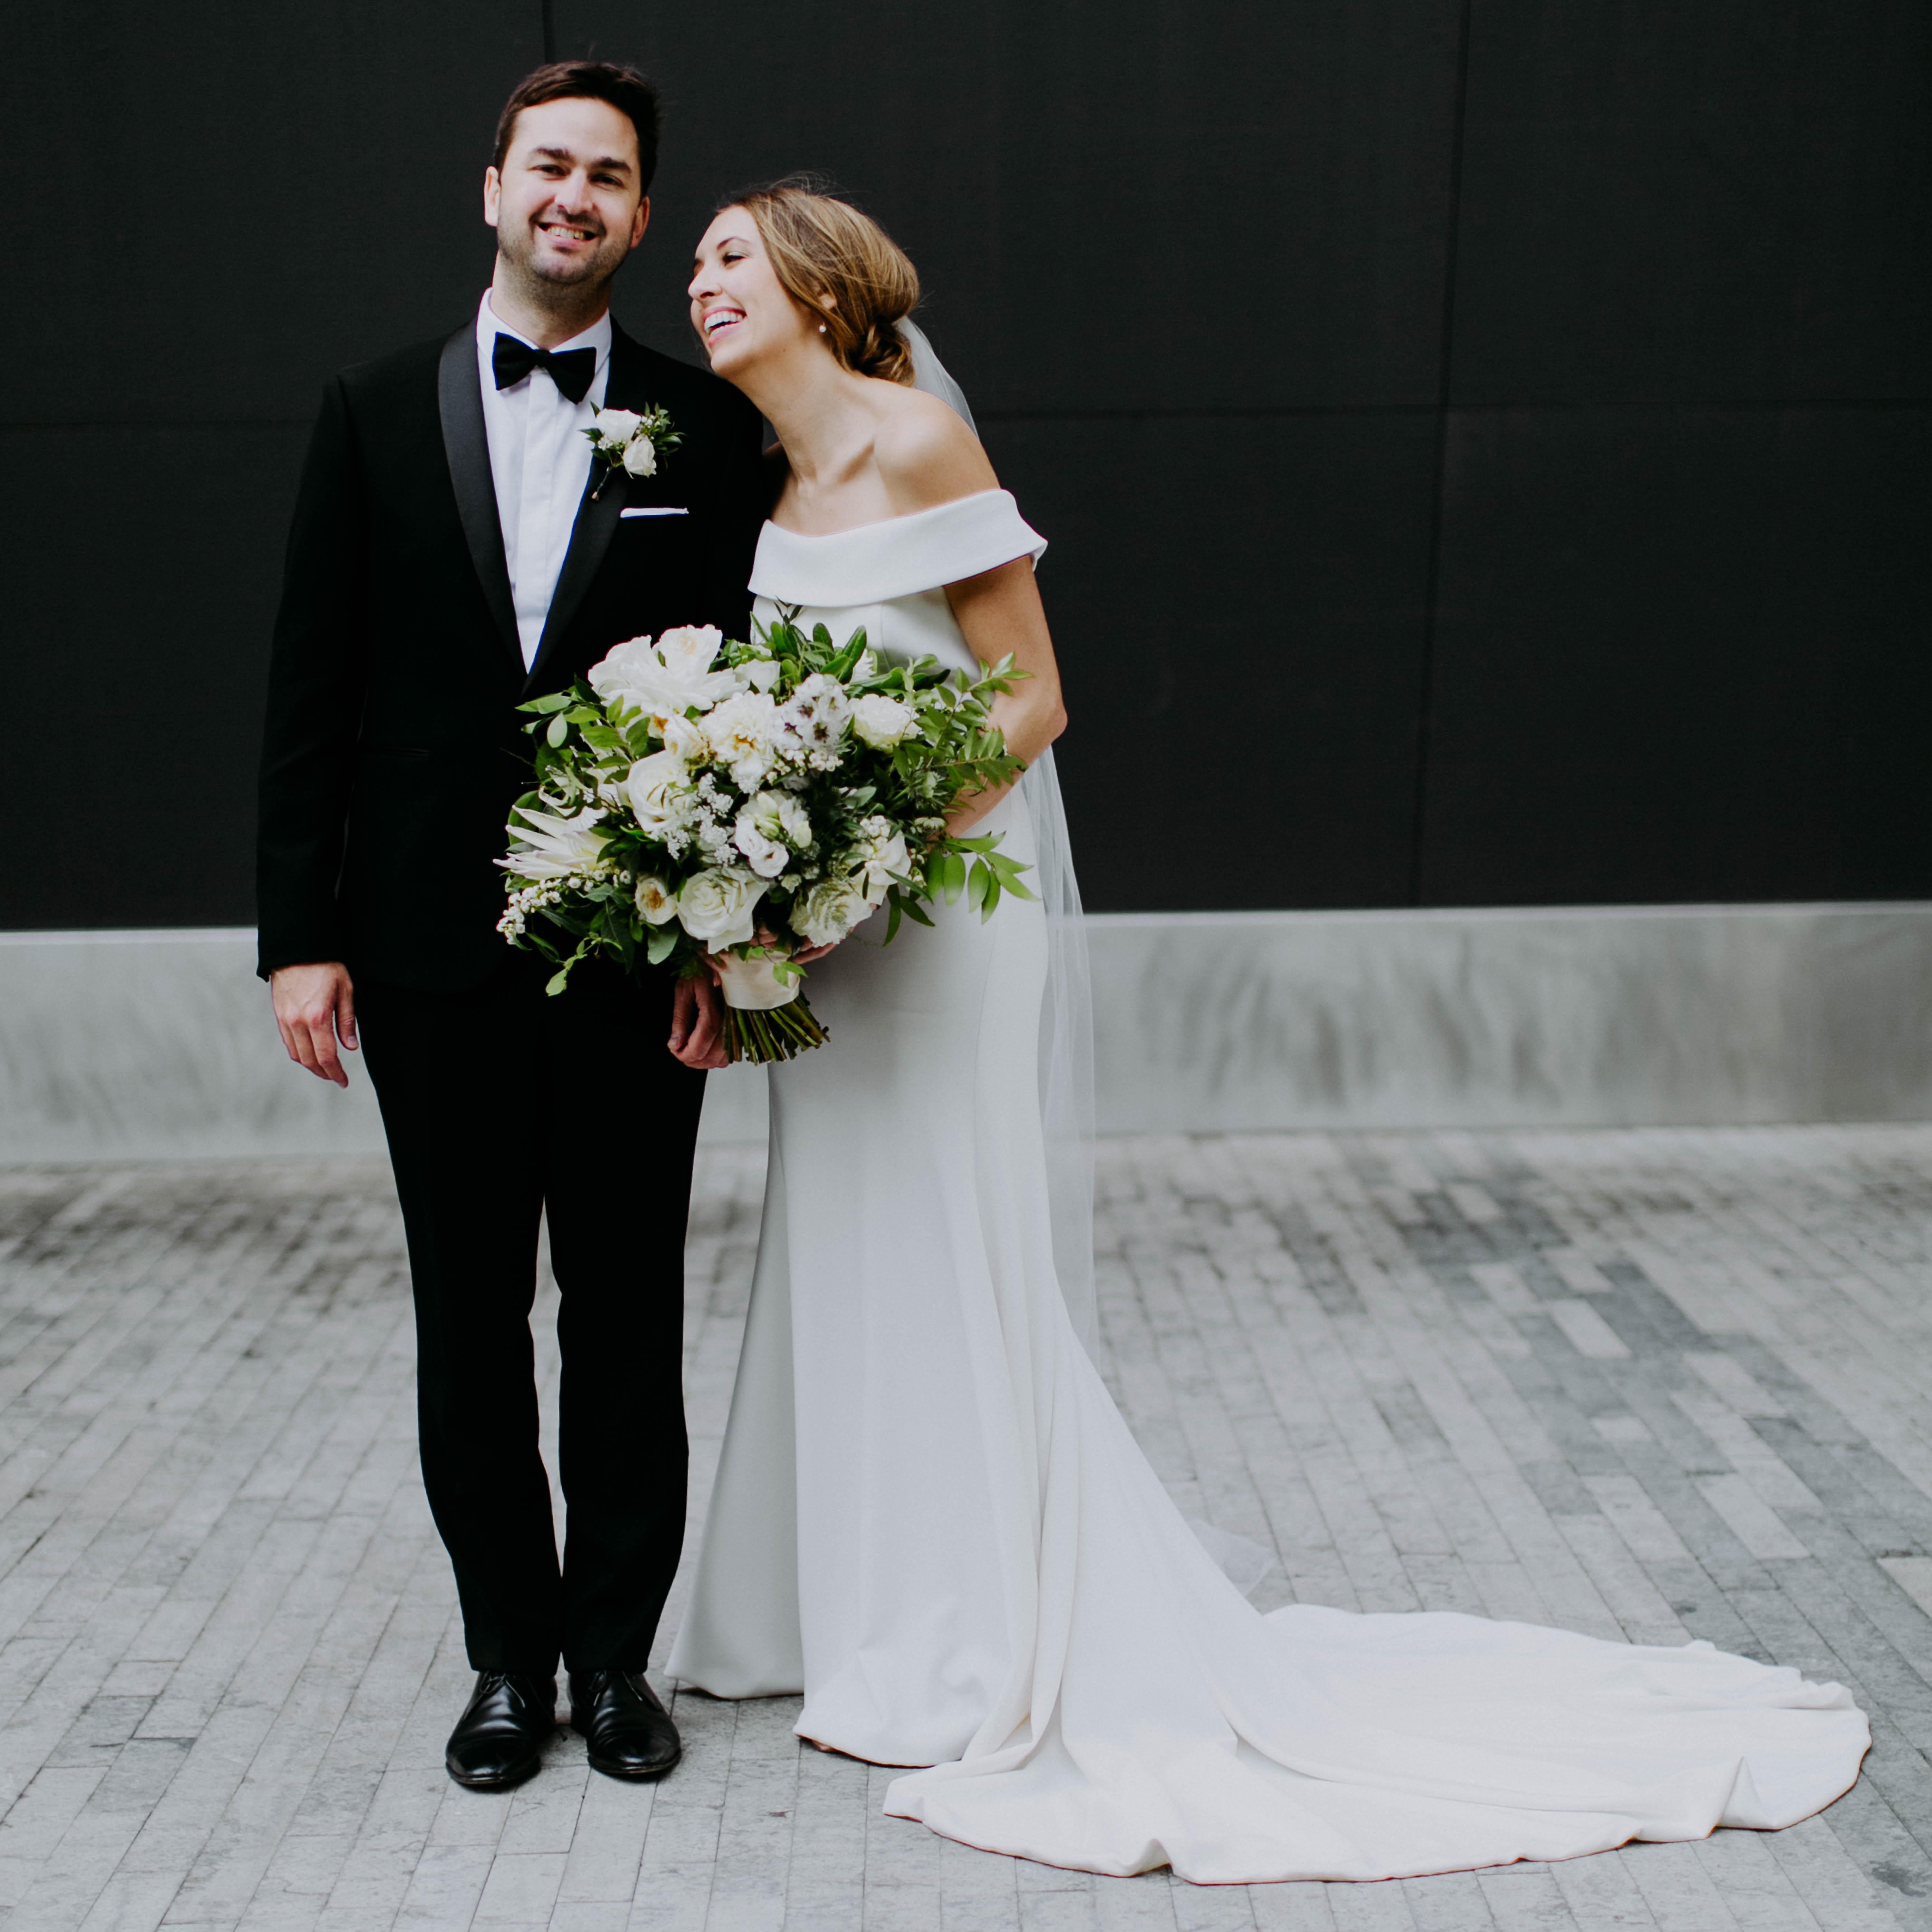 A Modern Wedding Celebration In The Heart Of Brooklyn